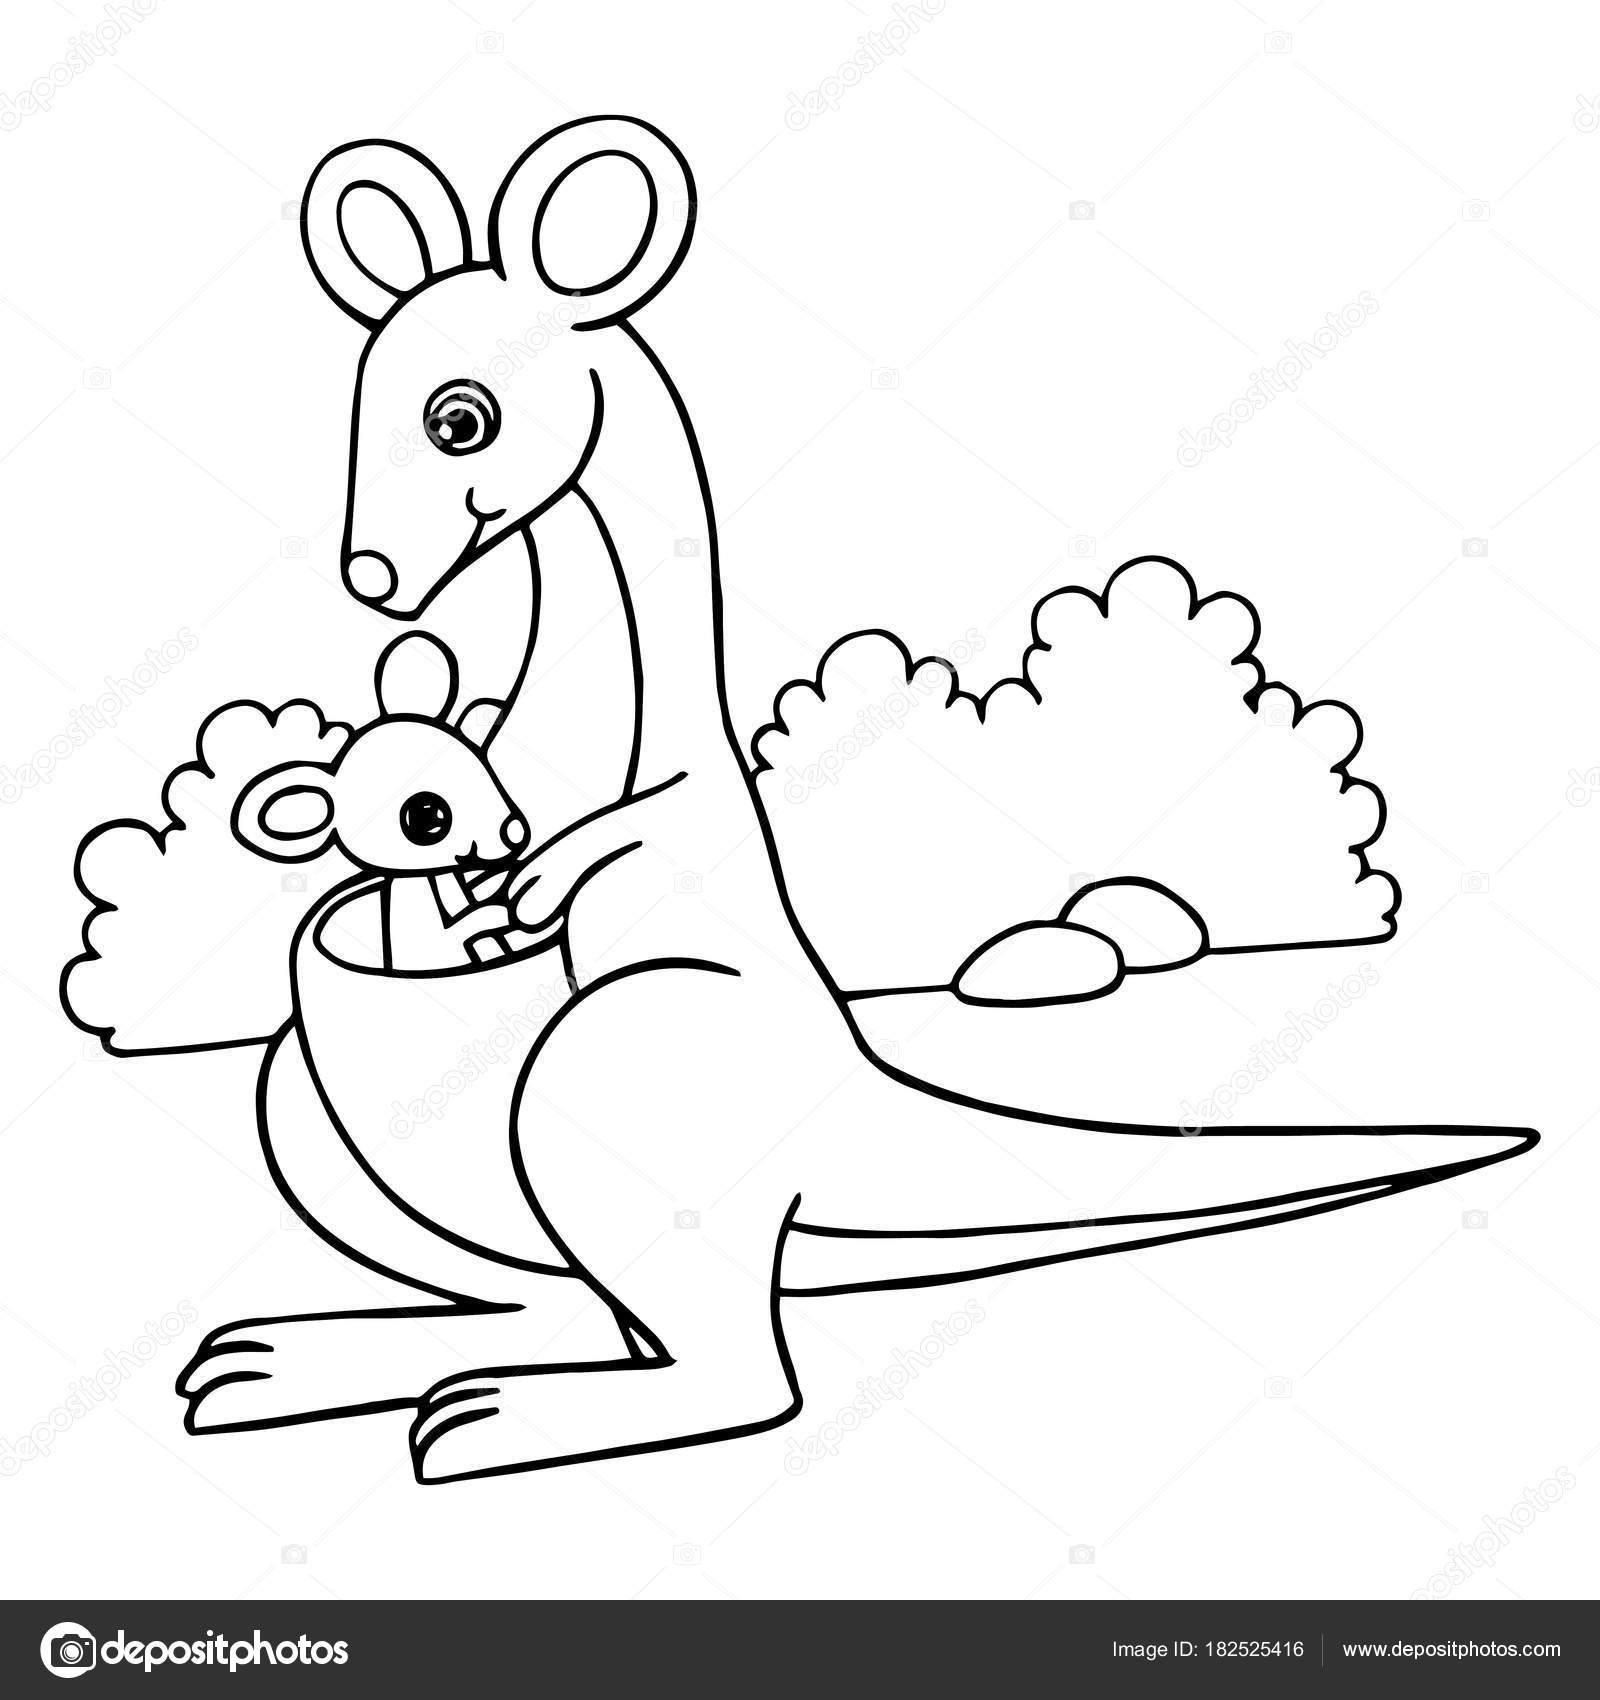 Cute Cartoon Kangaroo White Background Childrens Prints Shirt Color